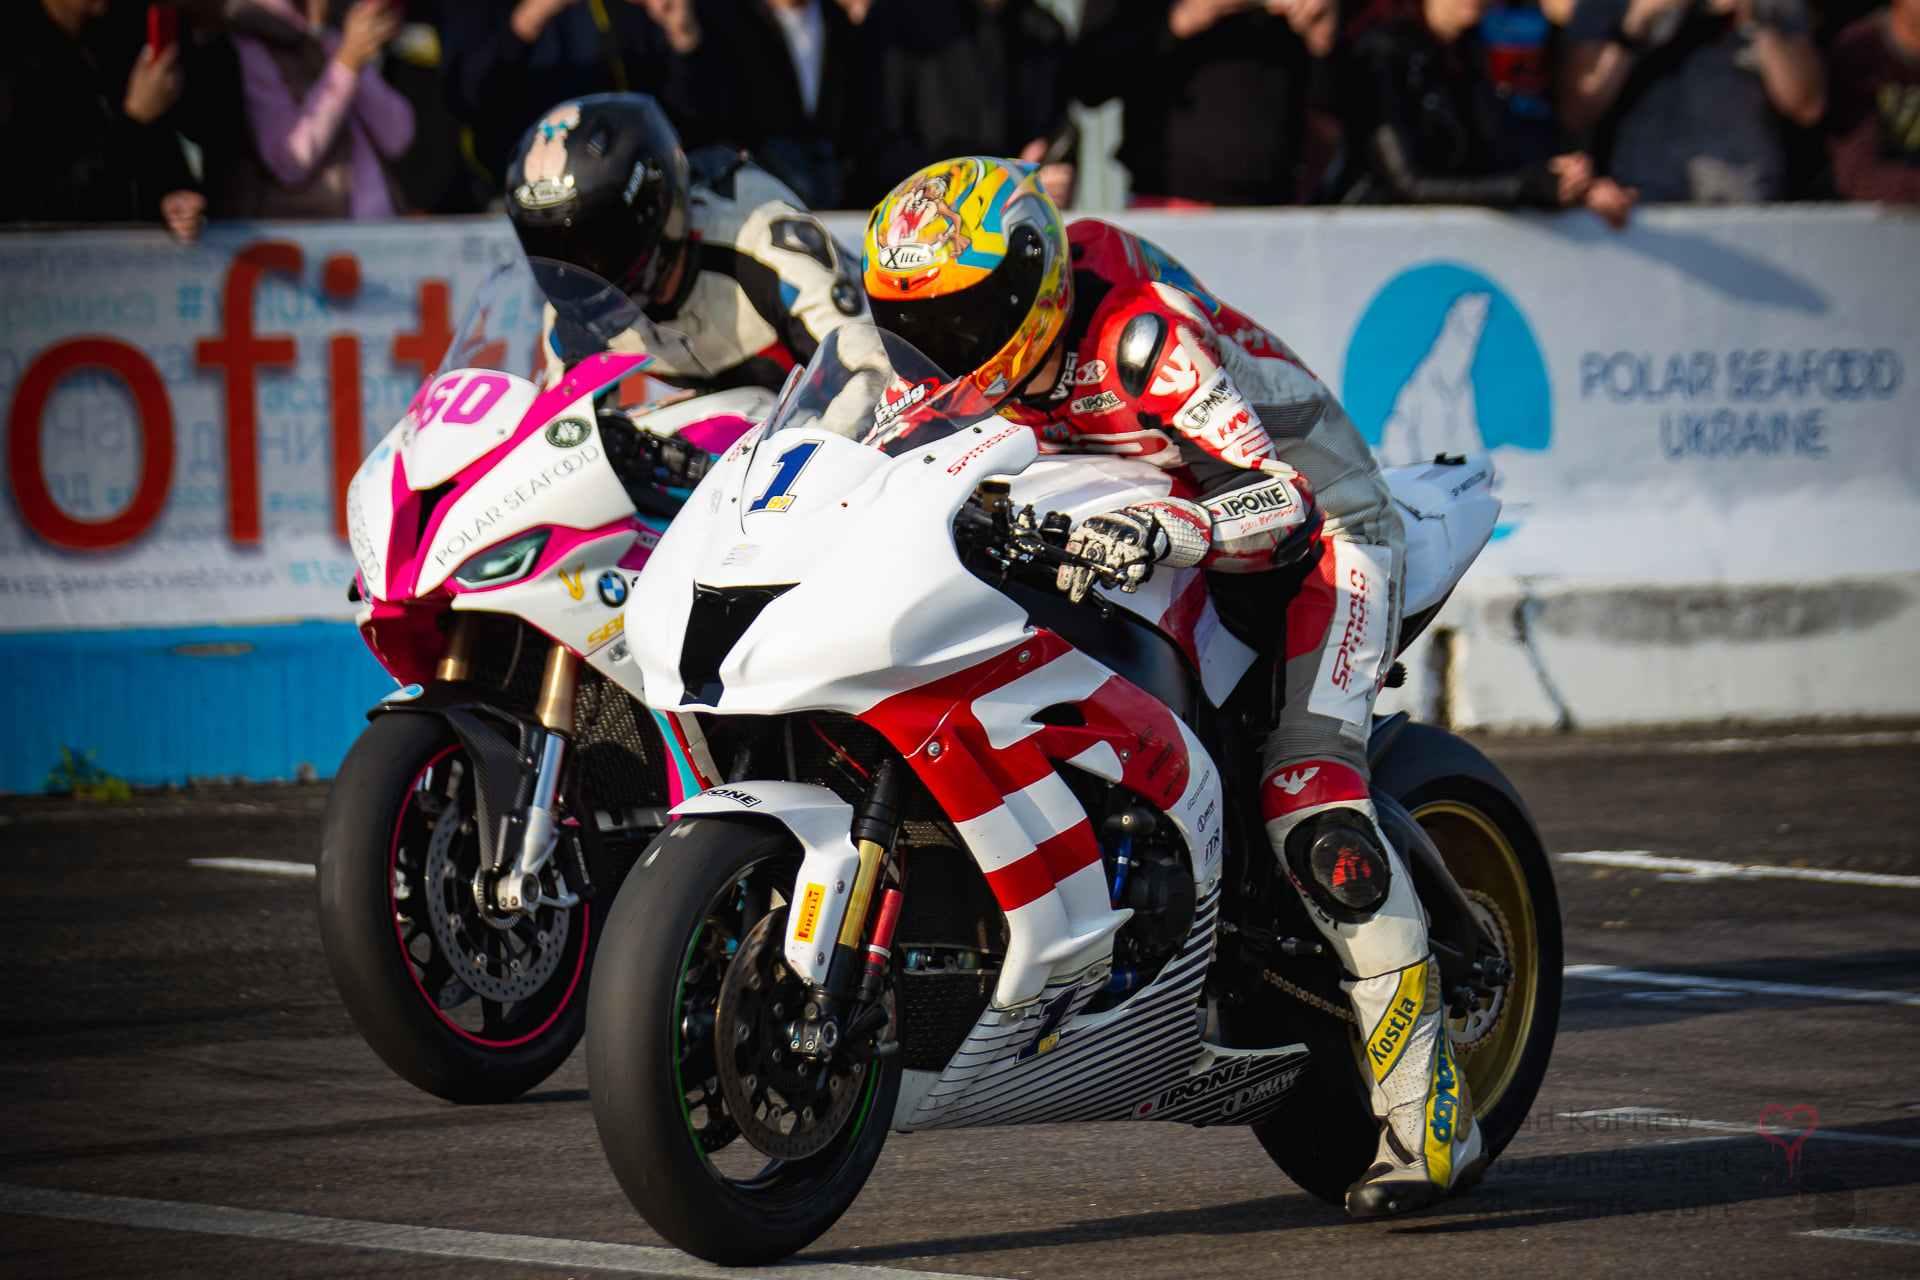 5-6_etap_MotoGPUkraine_153